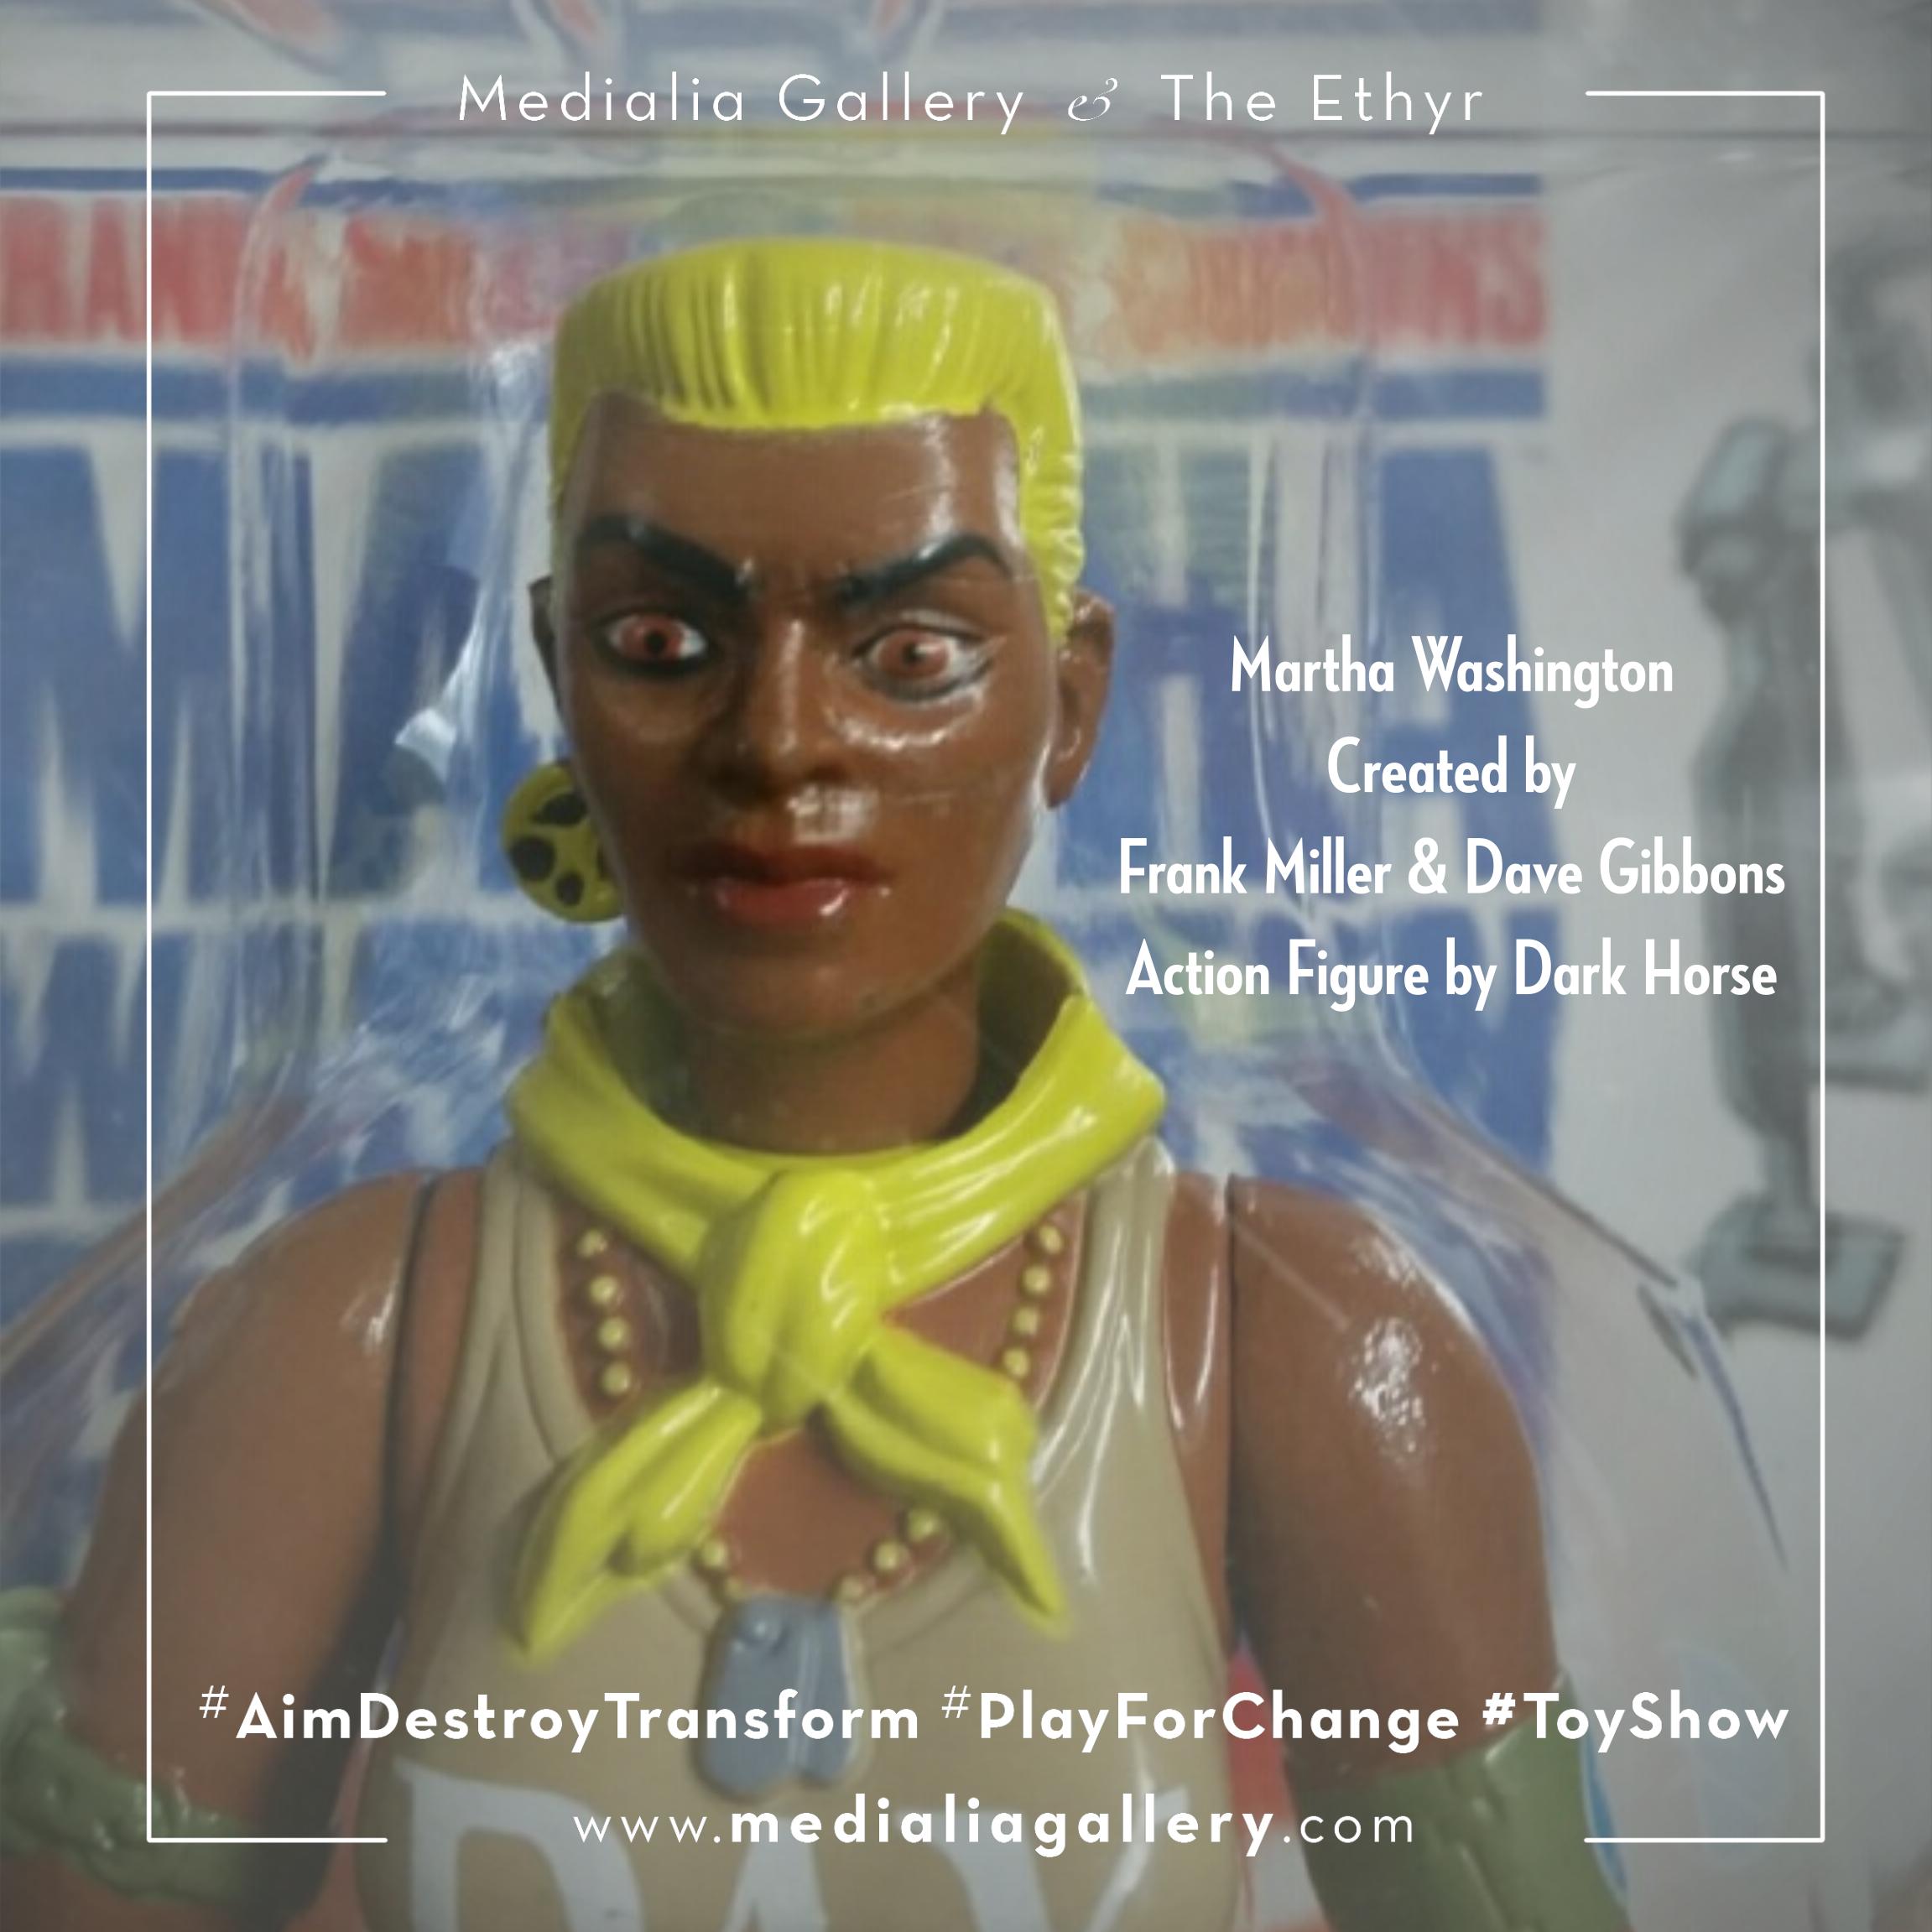 MedialiaGallery_The_Ethyr_AimDestroyTransform_Toy_Martha_Washington_Frank_Miller_Dave_Gibbons_November_2017.png